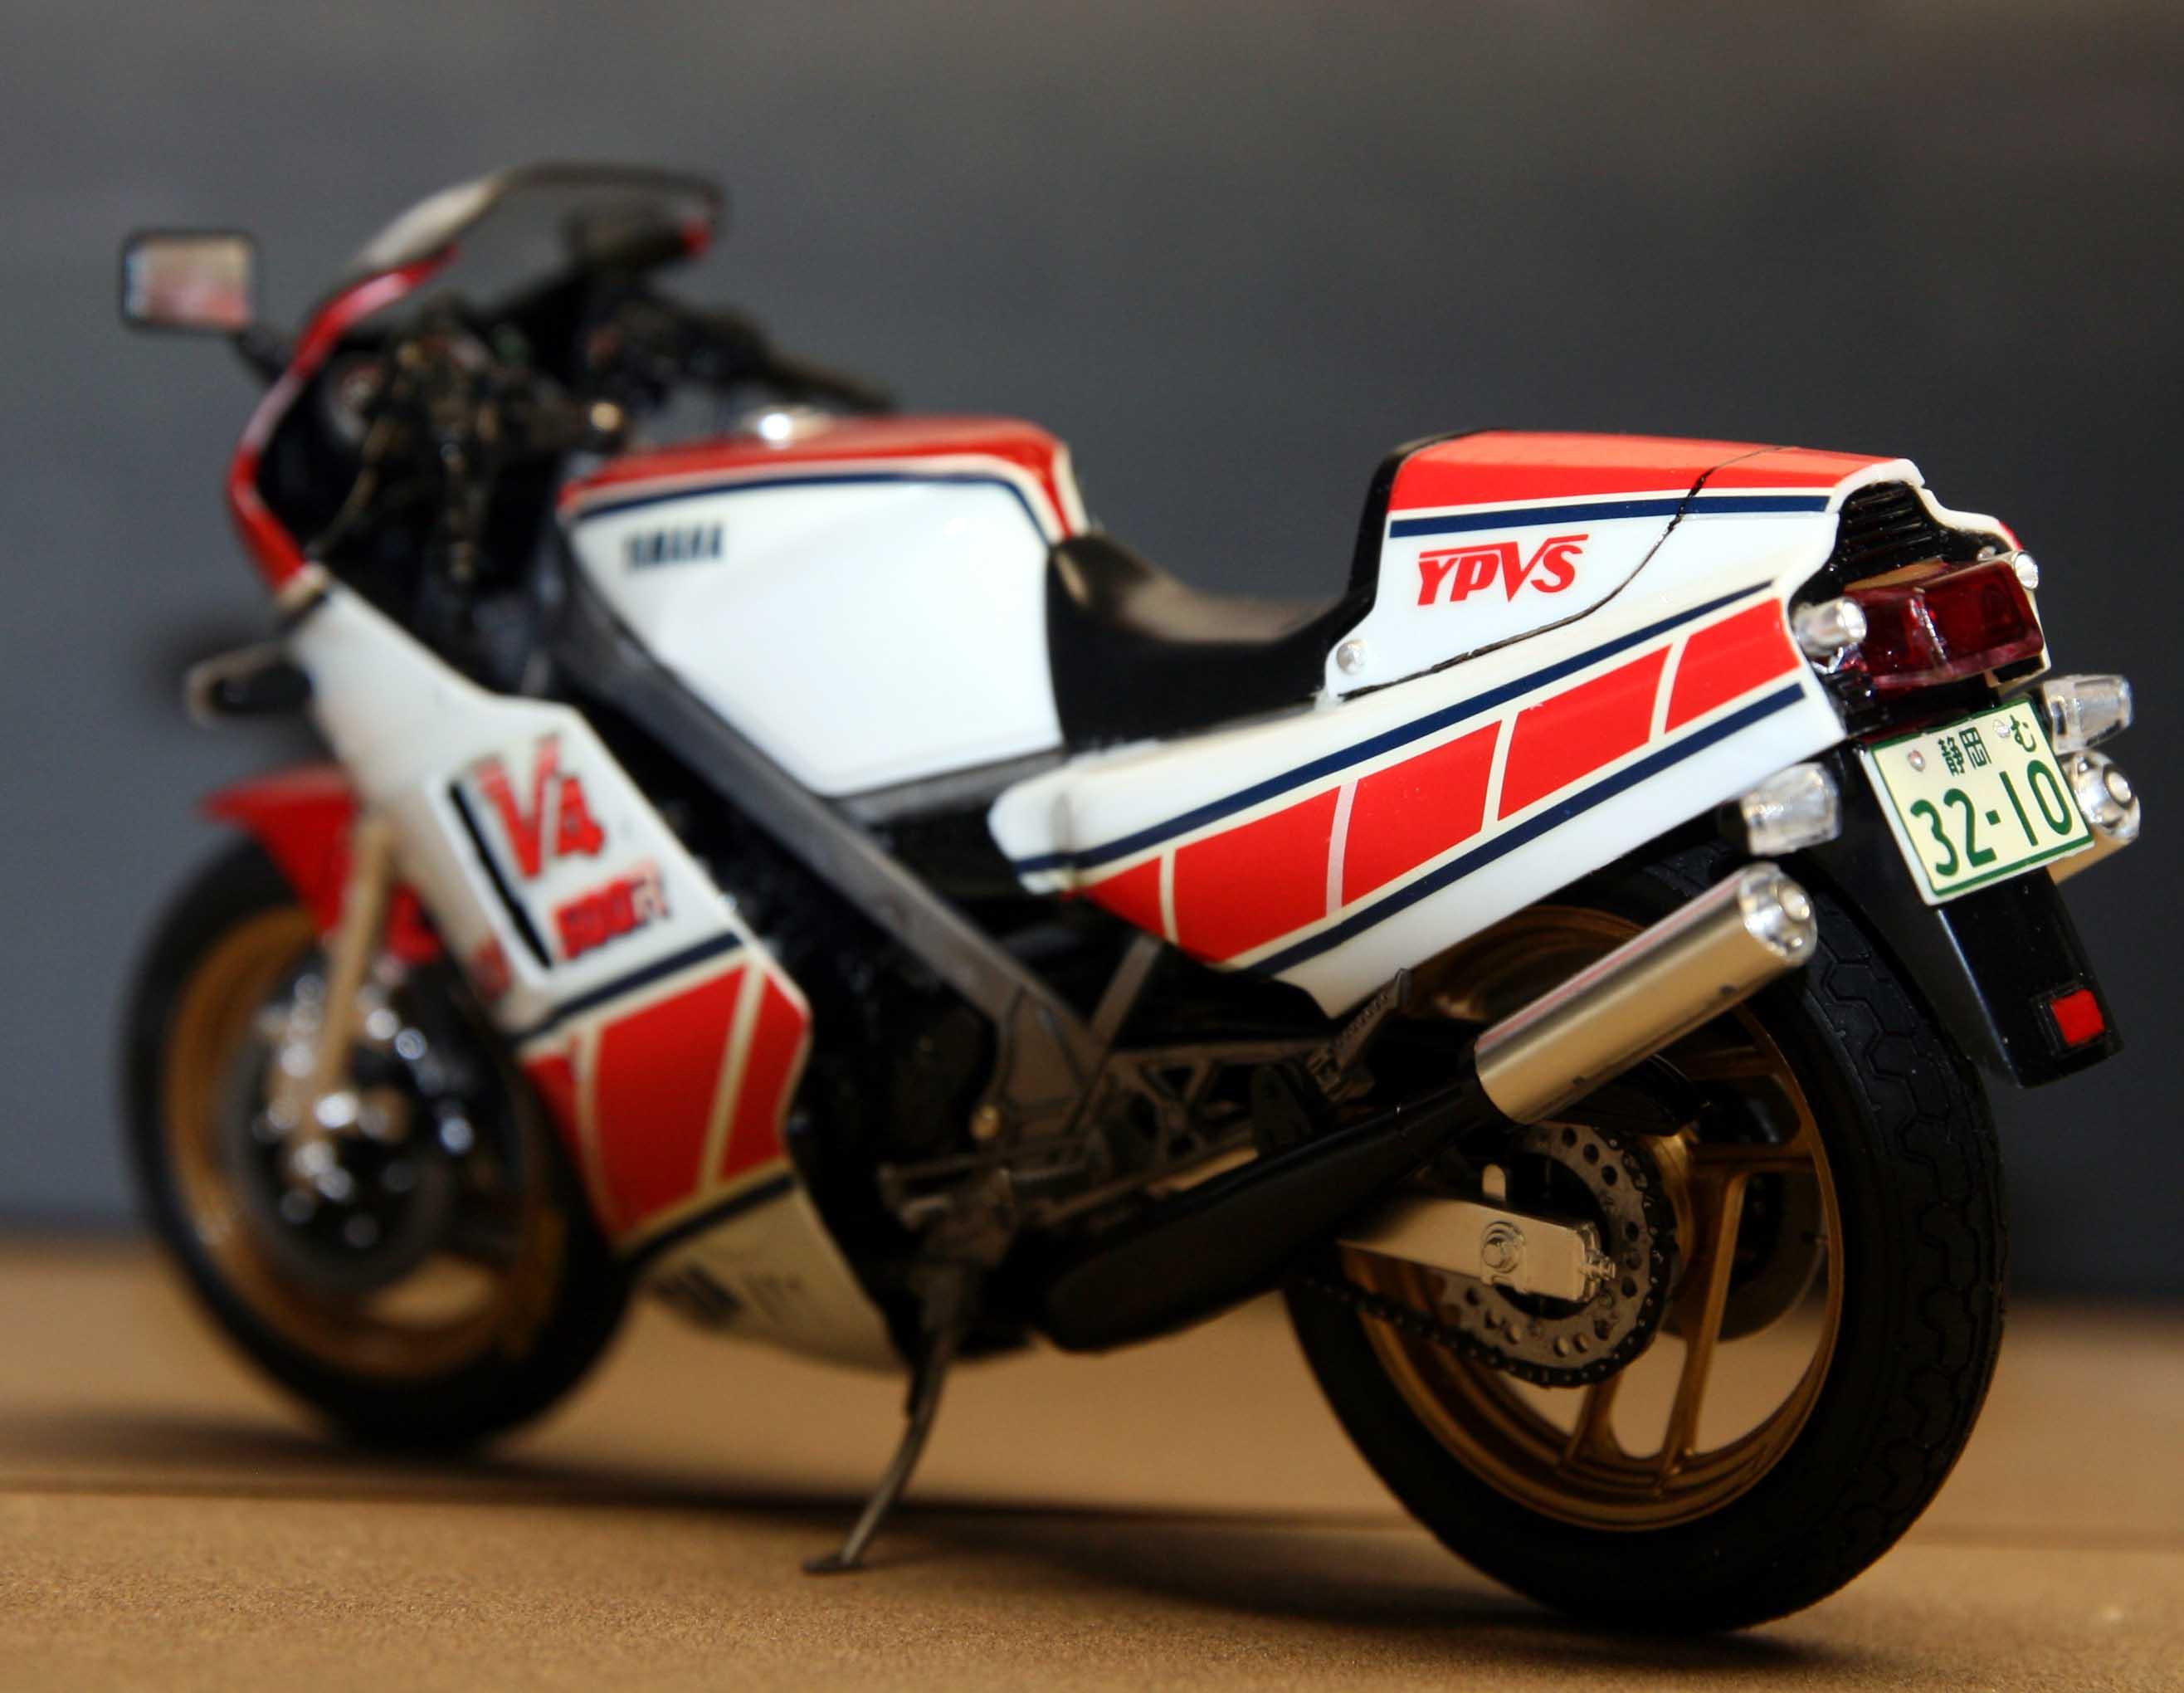 Yamaha Rzvr